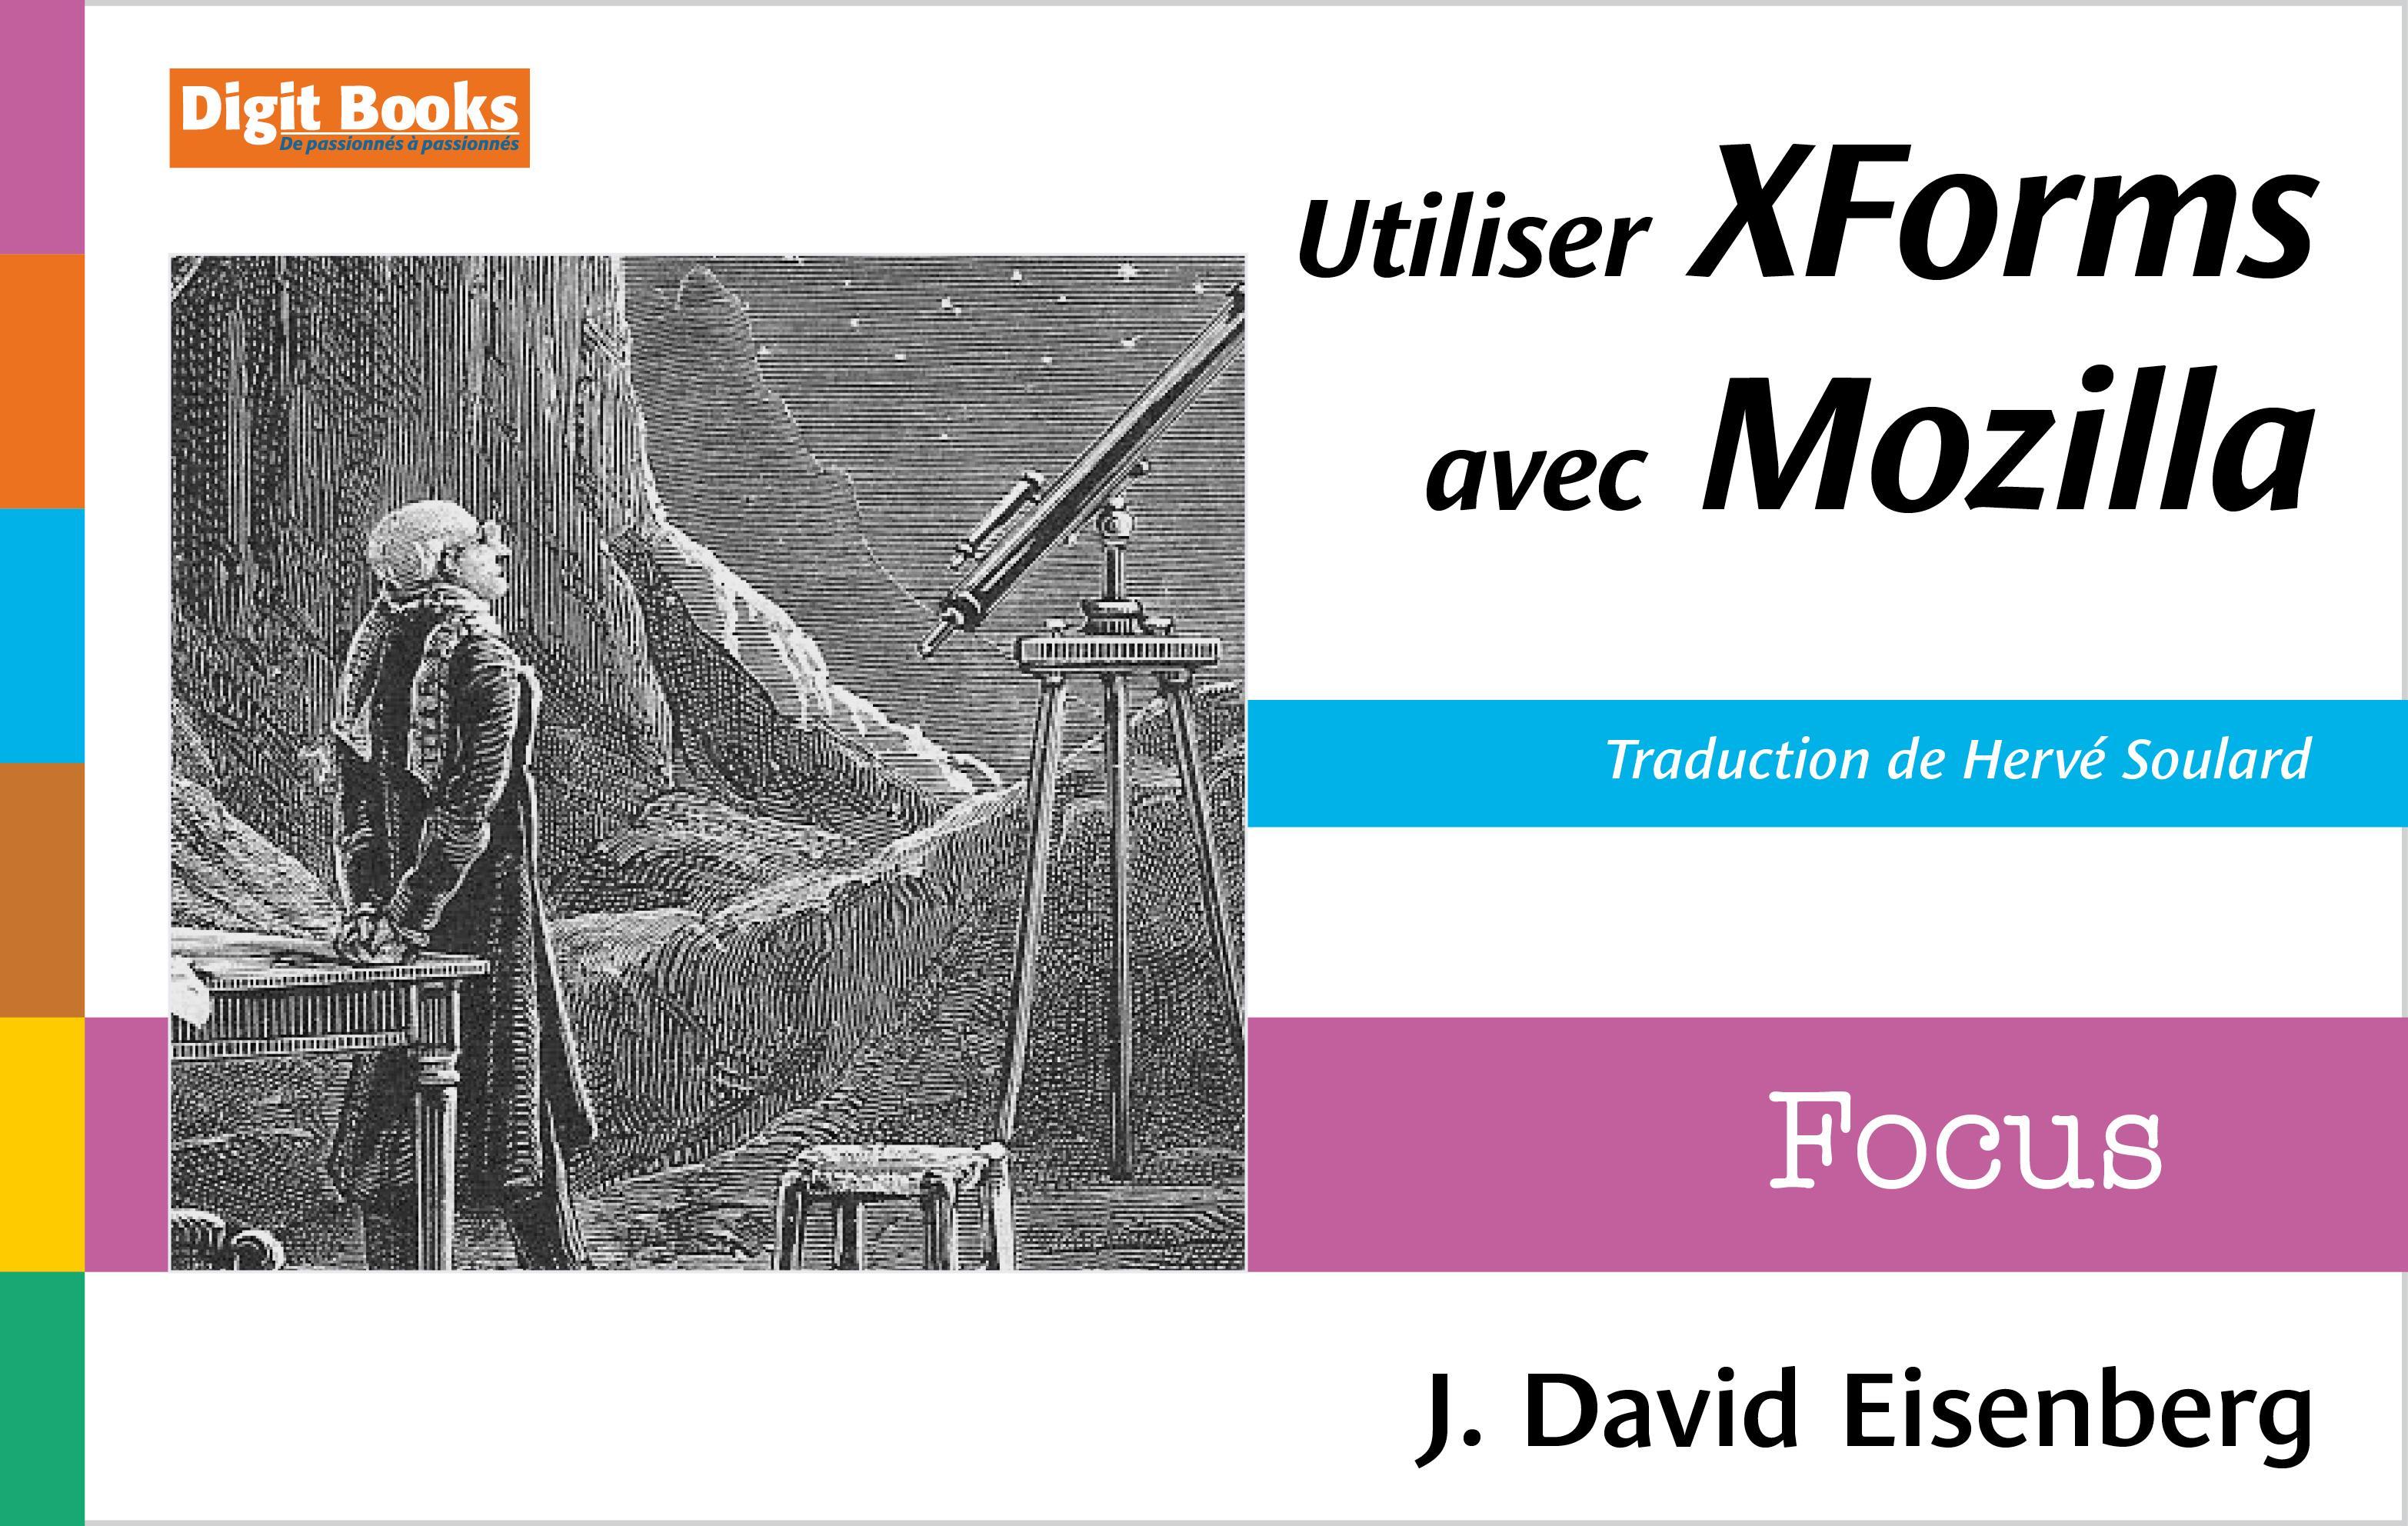 Utiliser XForms avec Mozilla